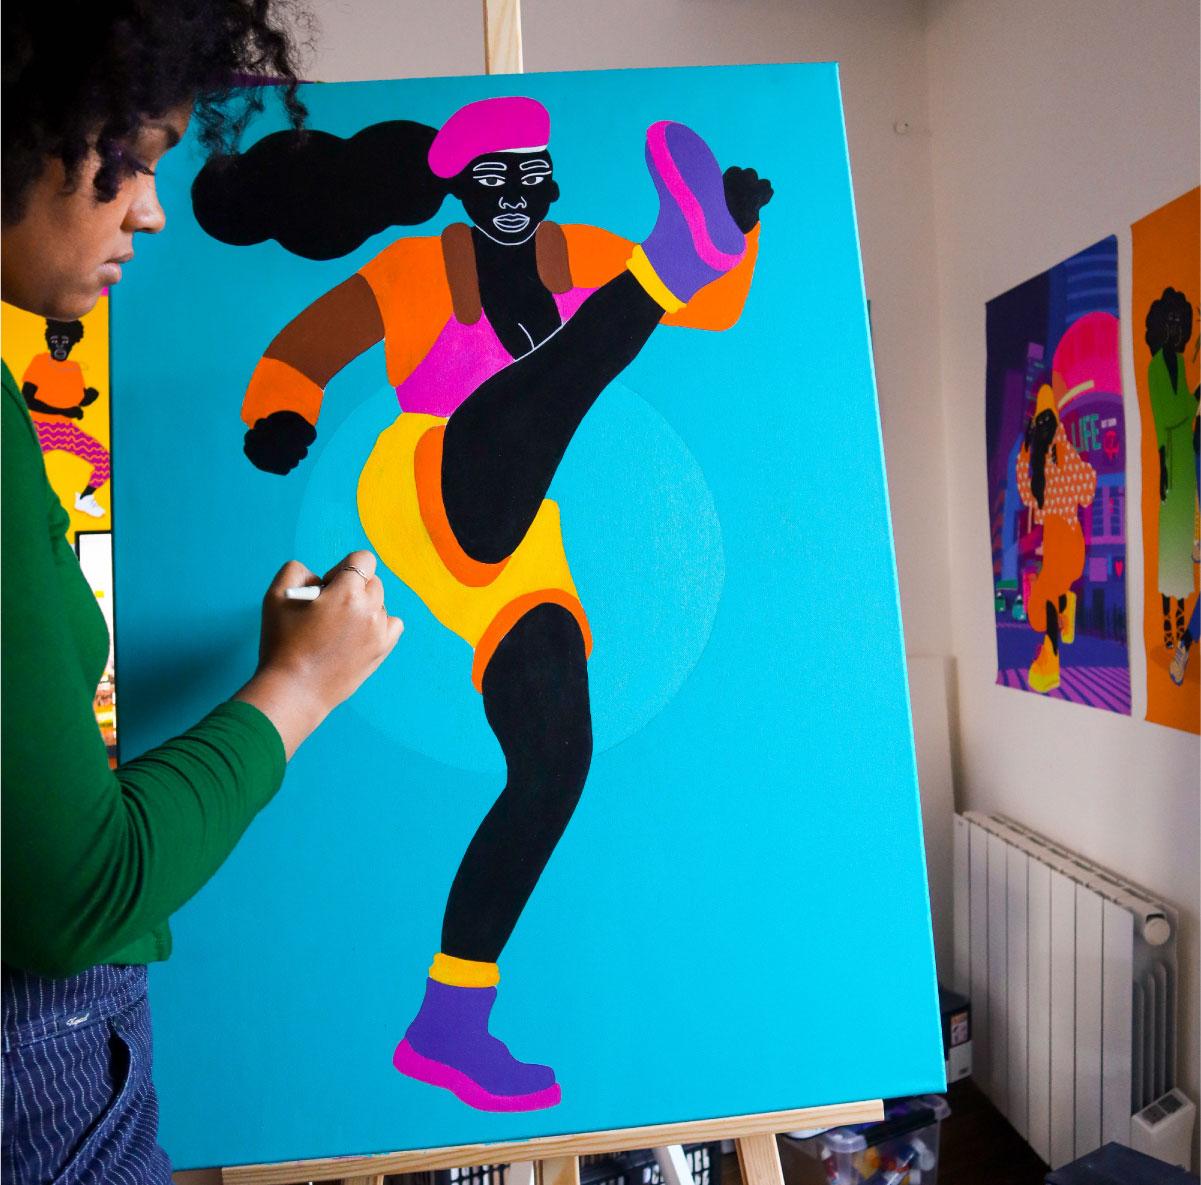 black, posters, photo, aurélia, painting, acrylic, mural, canvas